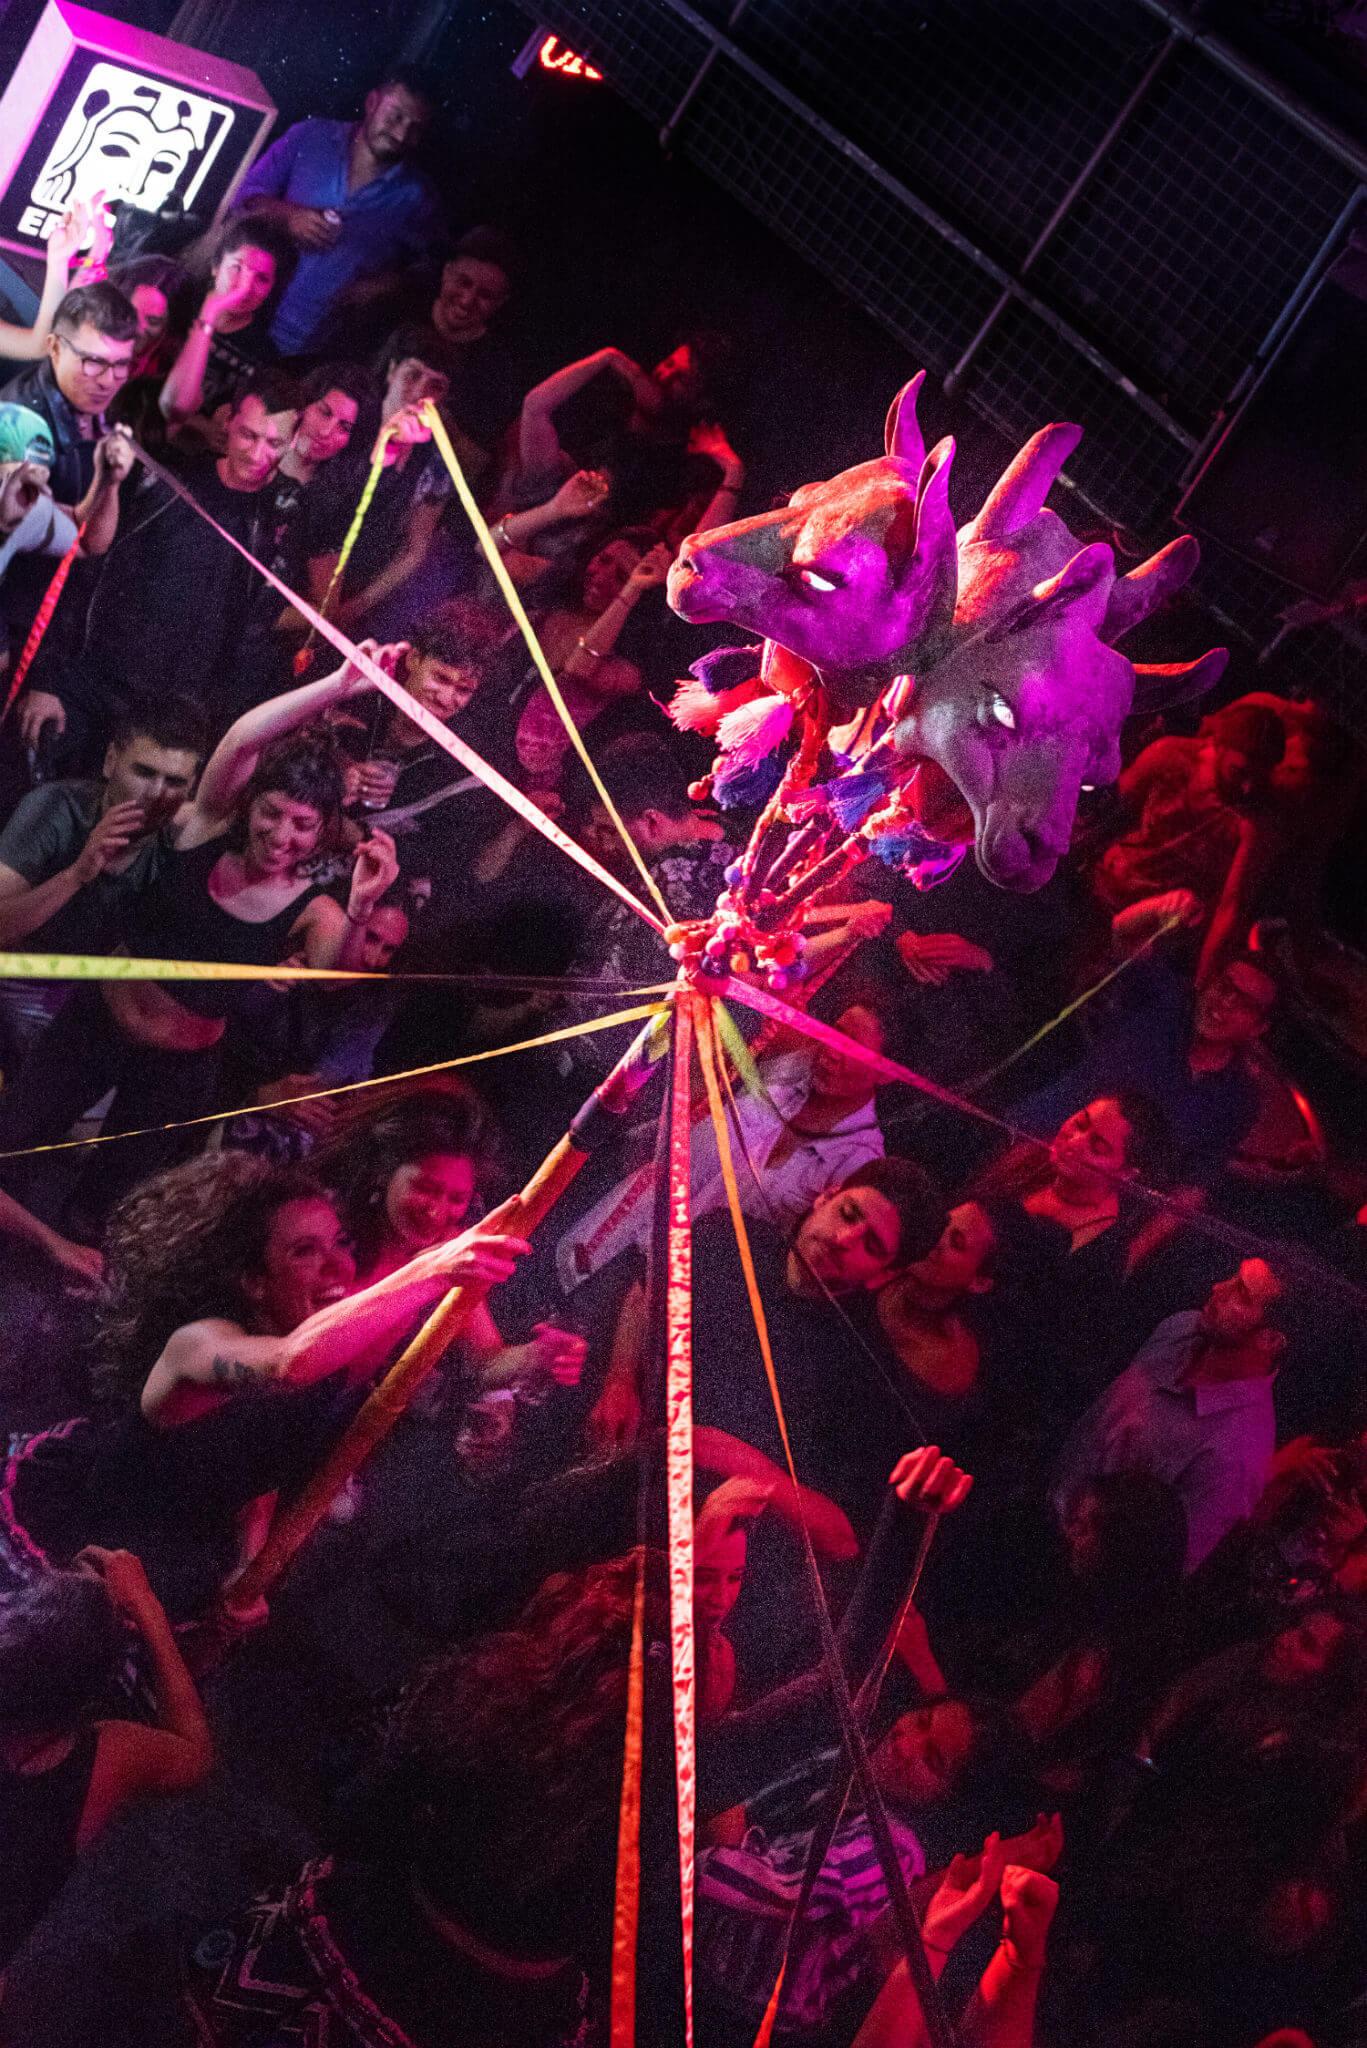 Festival Puchuncahuín: La fiesta mestiza del beat regresa a Maitencillo en 2019